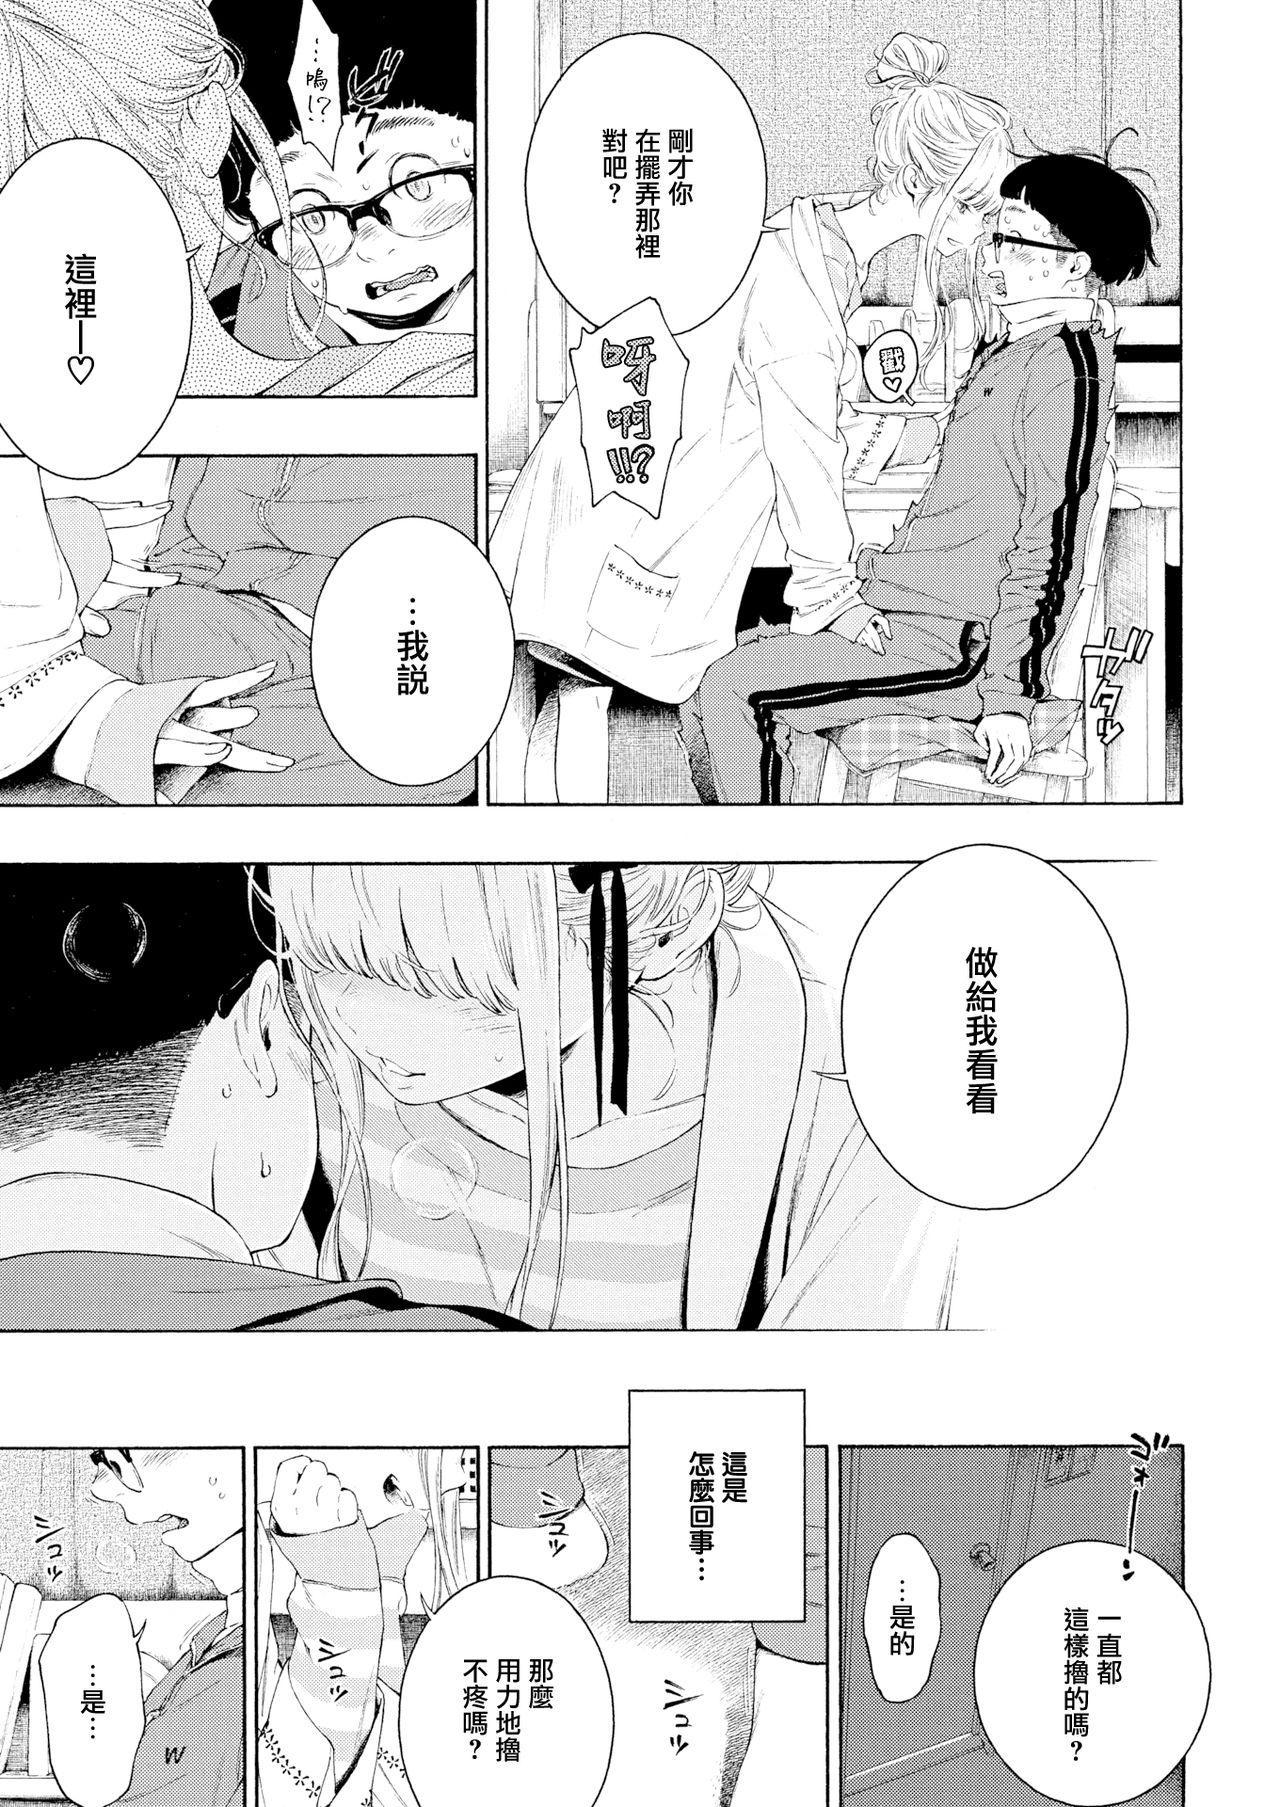 Hime Hajime 6